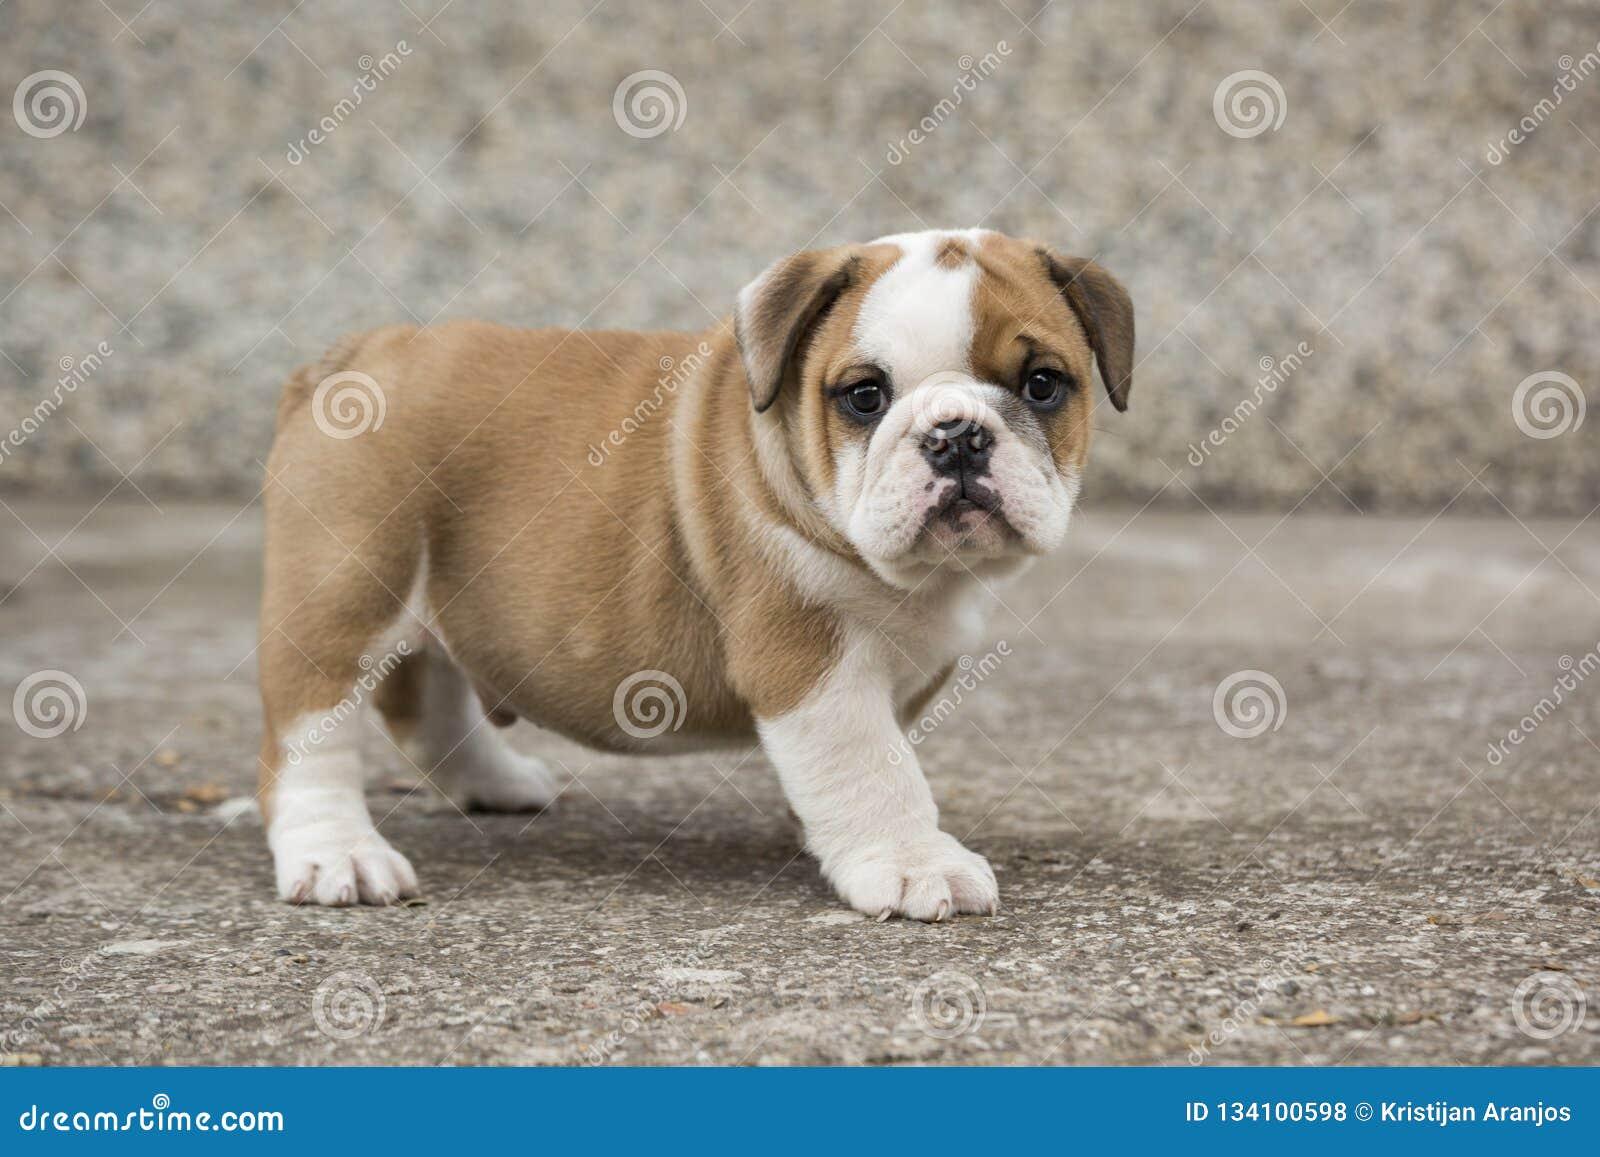 English Bulldog Puppies Backyard Playing Young Dogs Stock Photo Image Of Canine Doggy 134100598